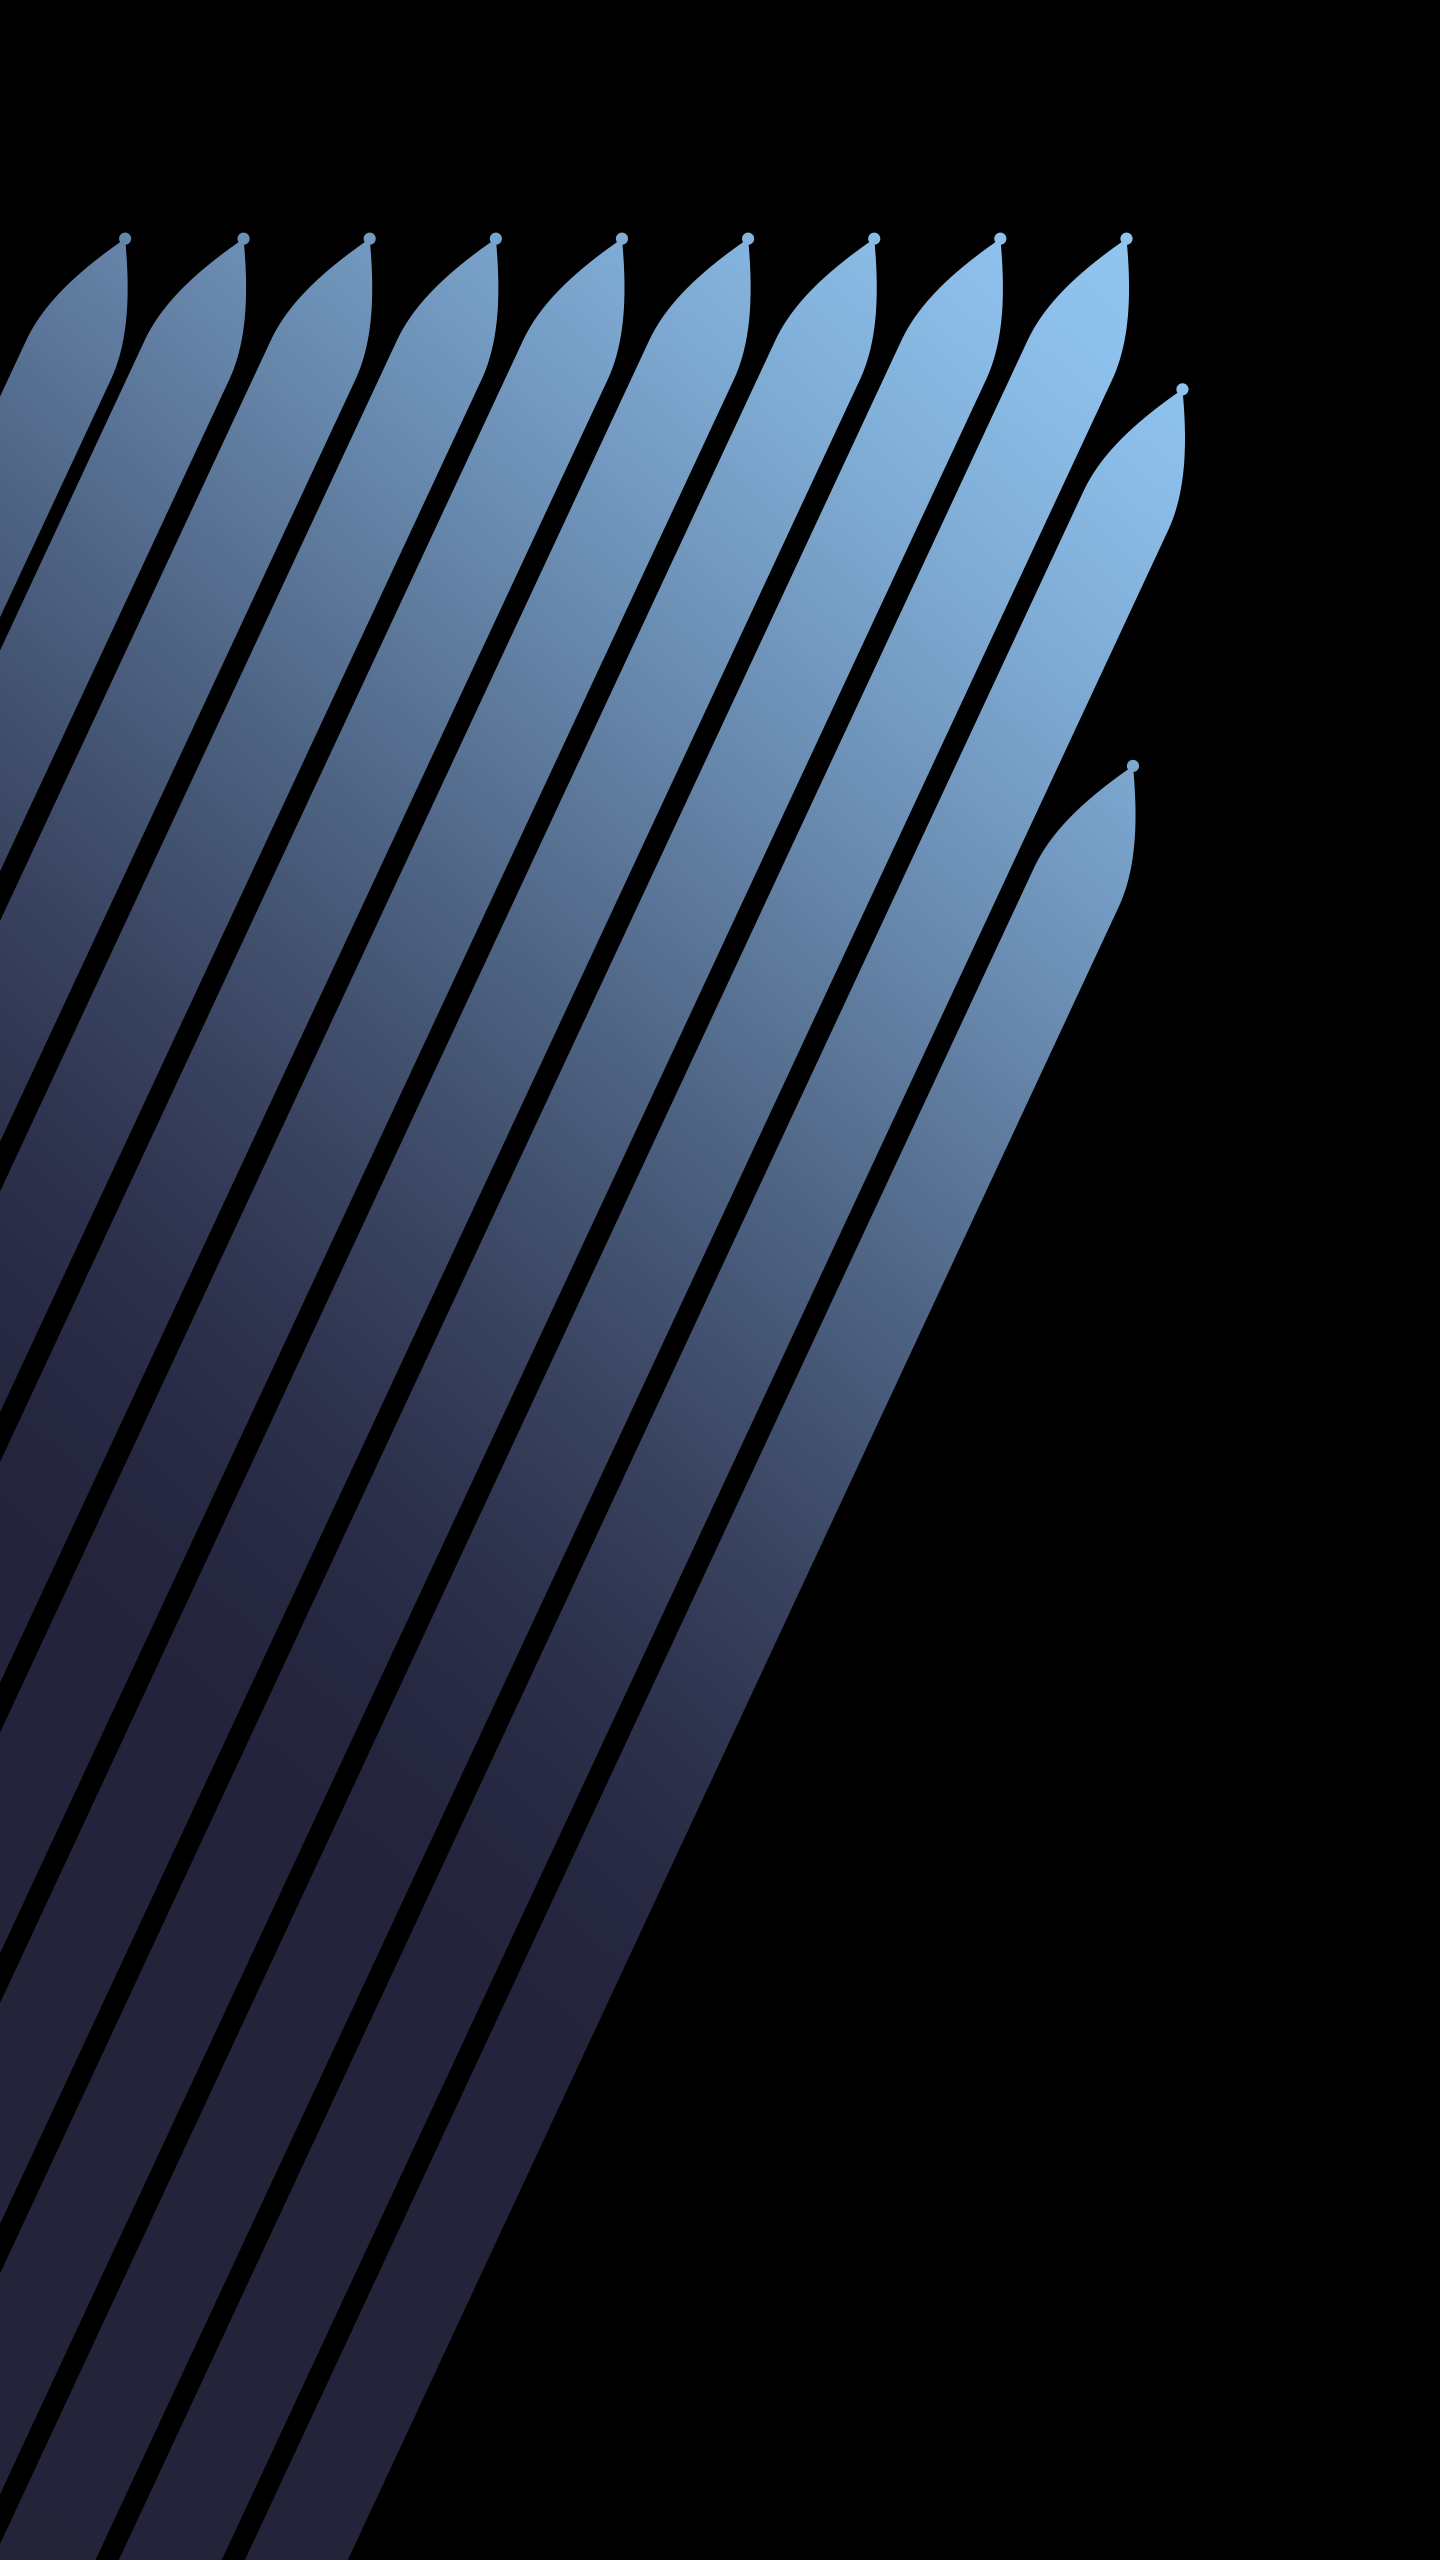 Galaxy Note7 Wallpaper Note 7 Wallpaper Hd 1152x2048 Wallpaper Teahub Io